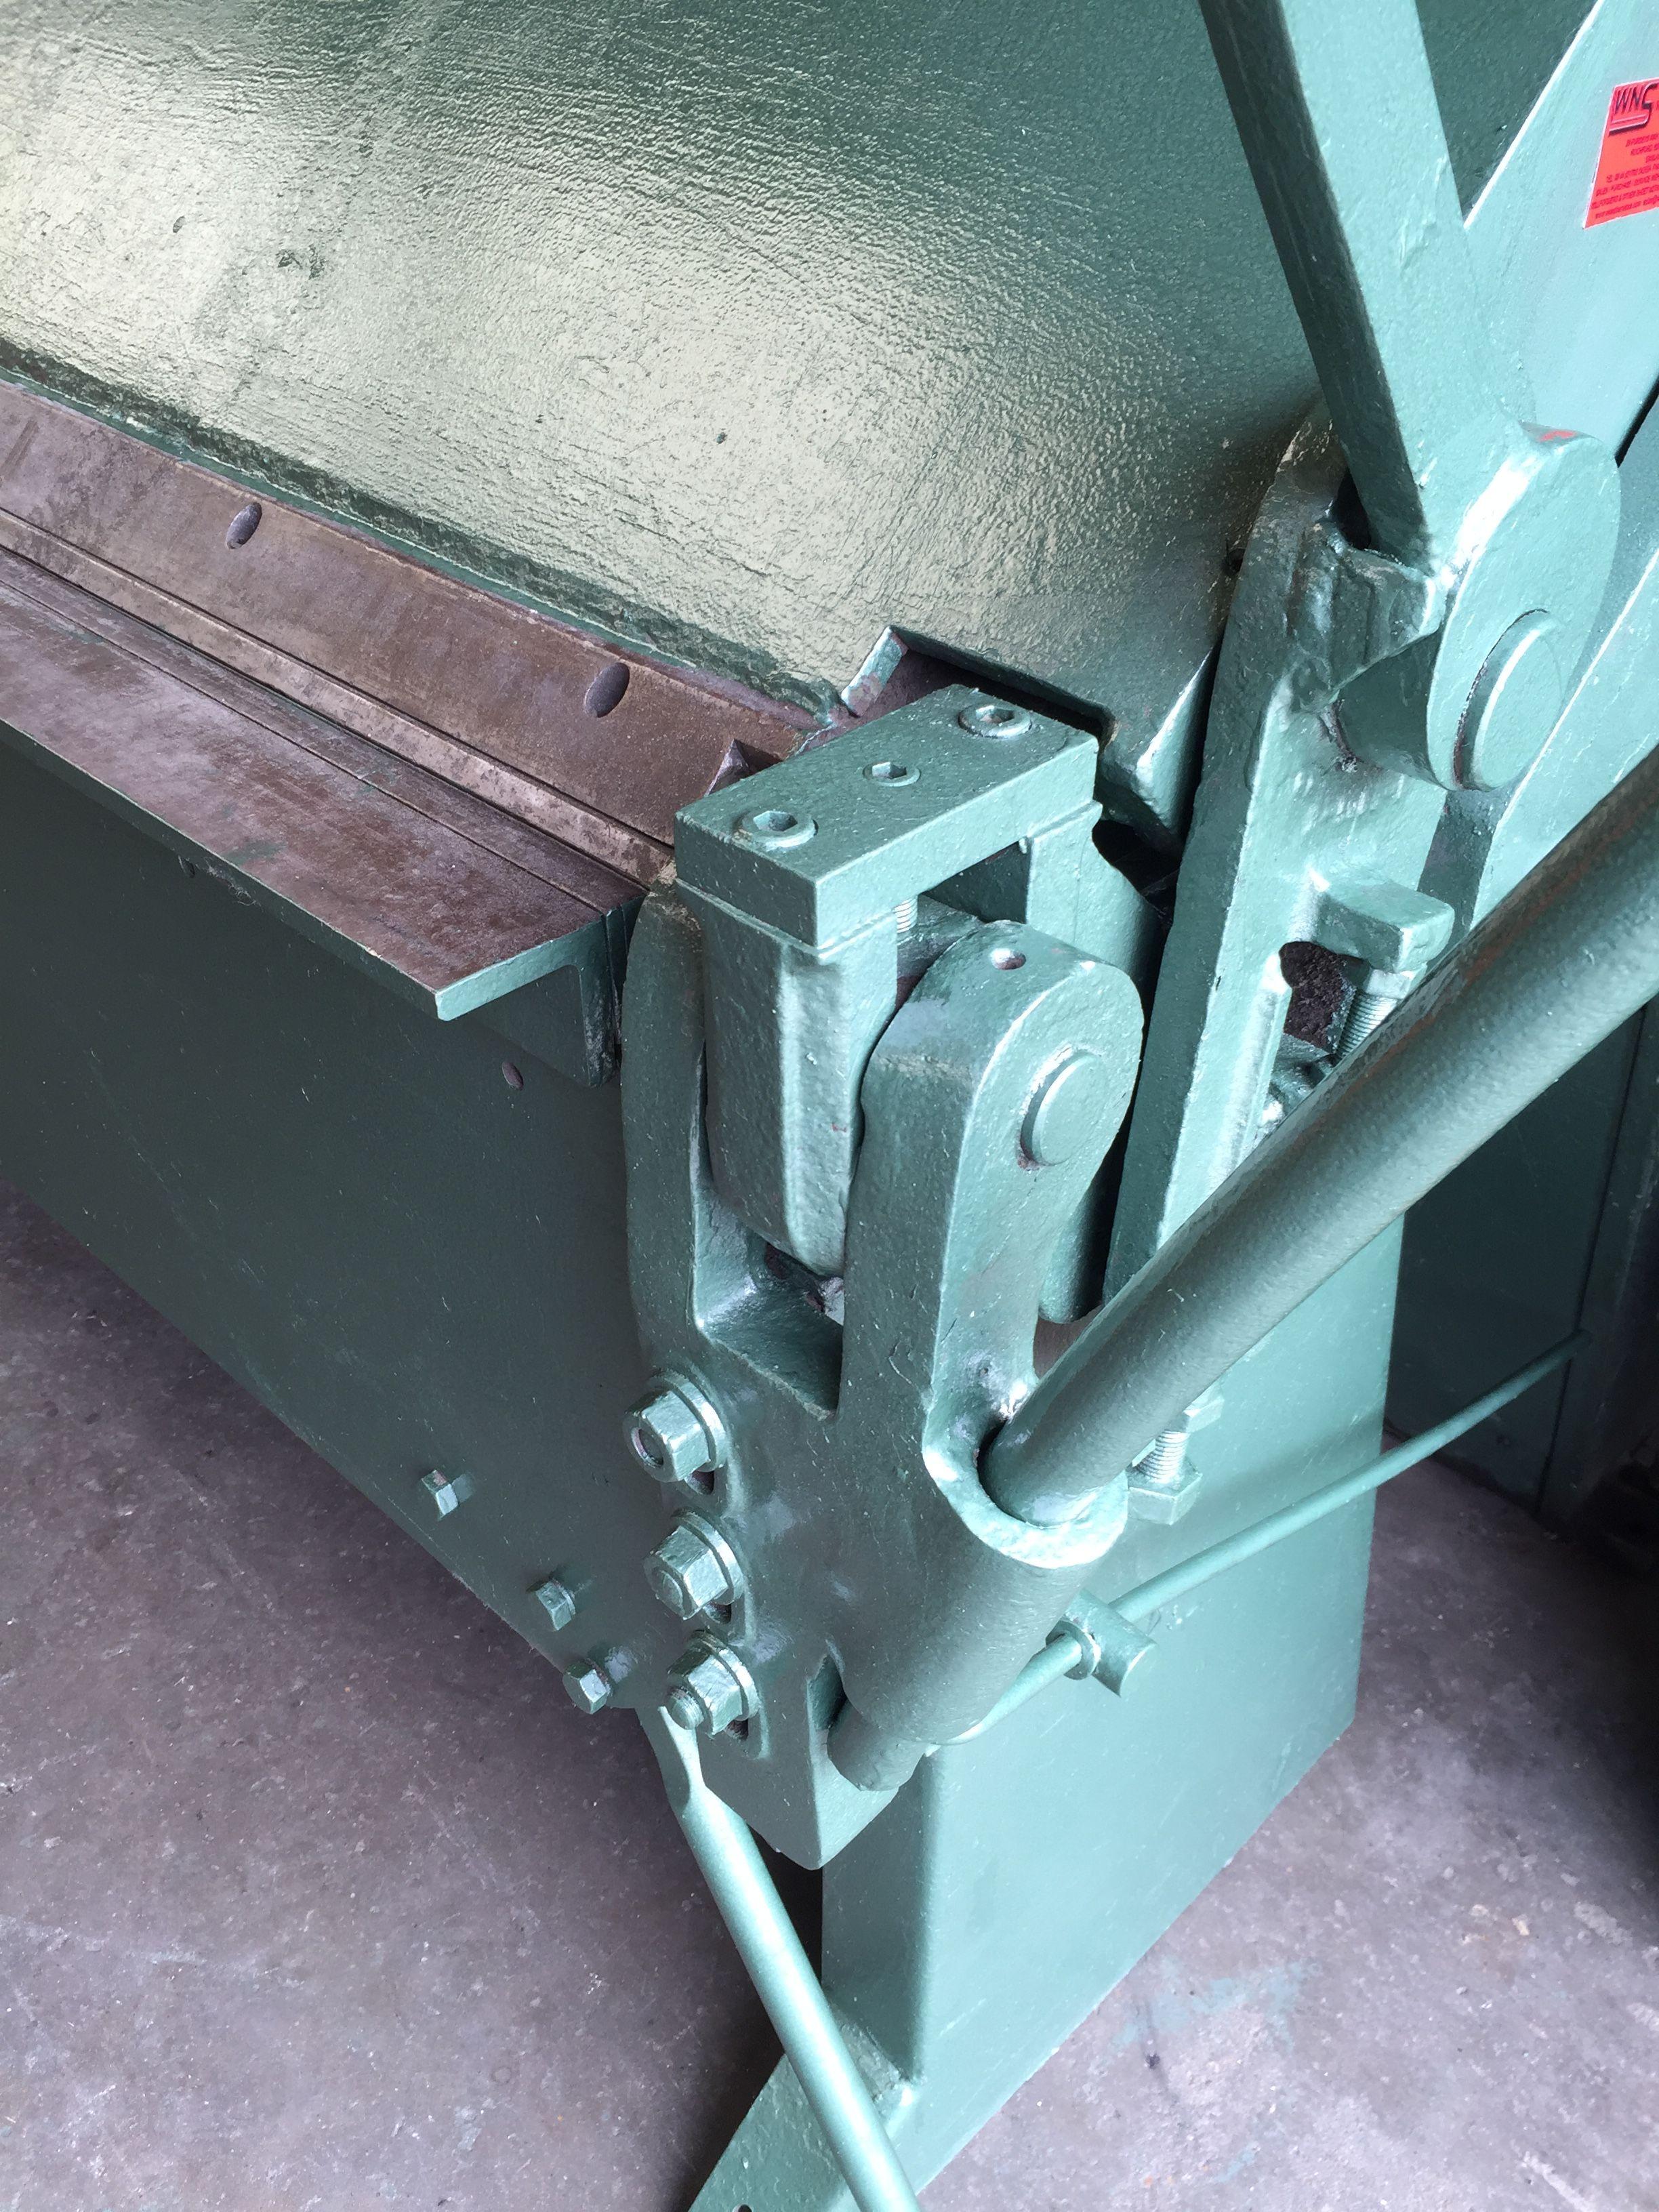 Edwards Sheet Metal Straight Blade Folder Fabrication Tools Metal Tools Metal Fabrication Tools